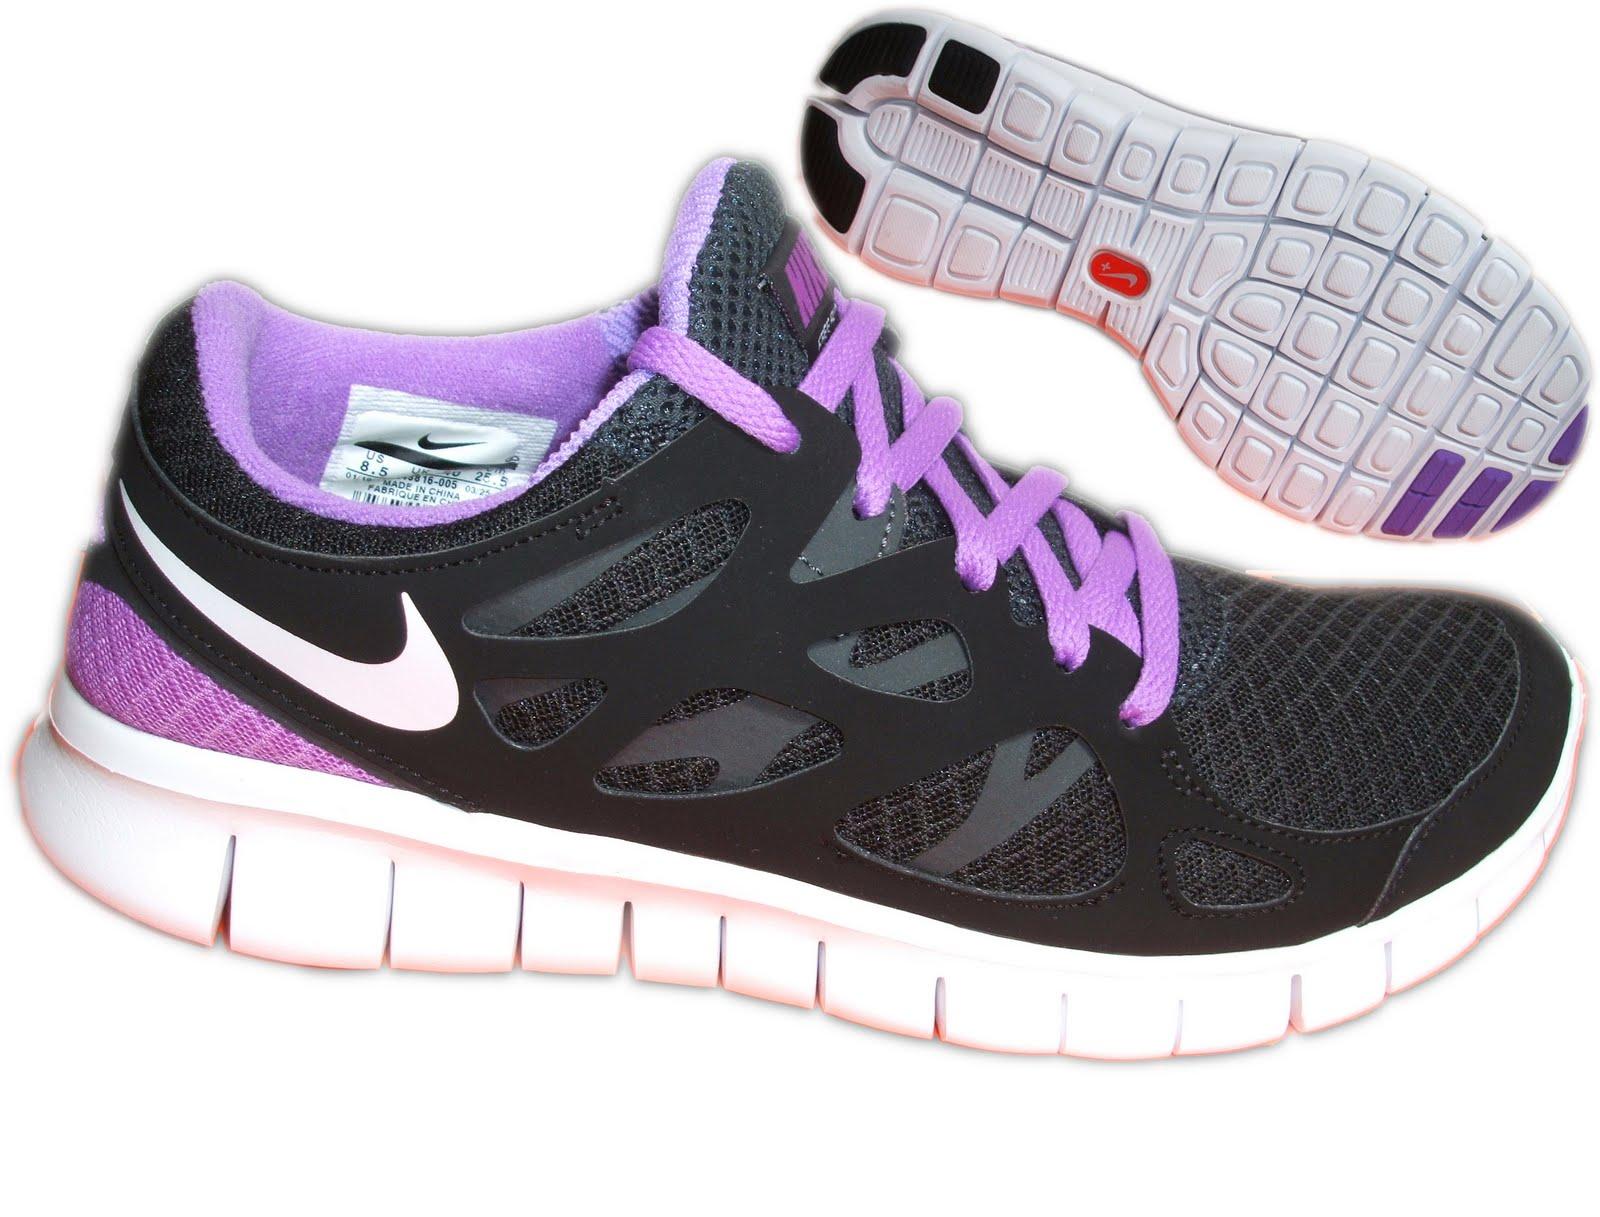 Nike Womens Shoe Sale Australia